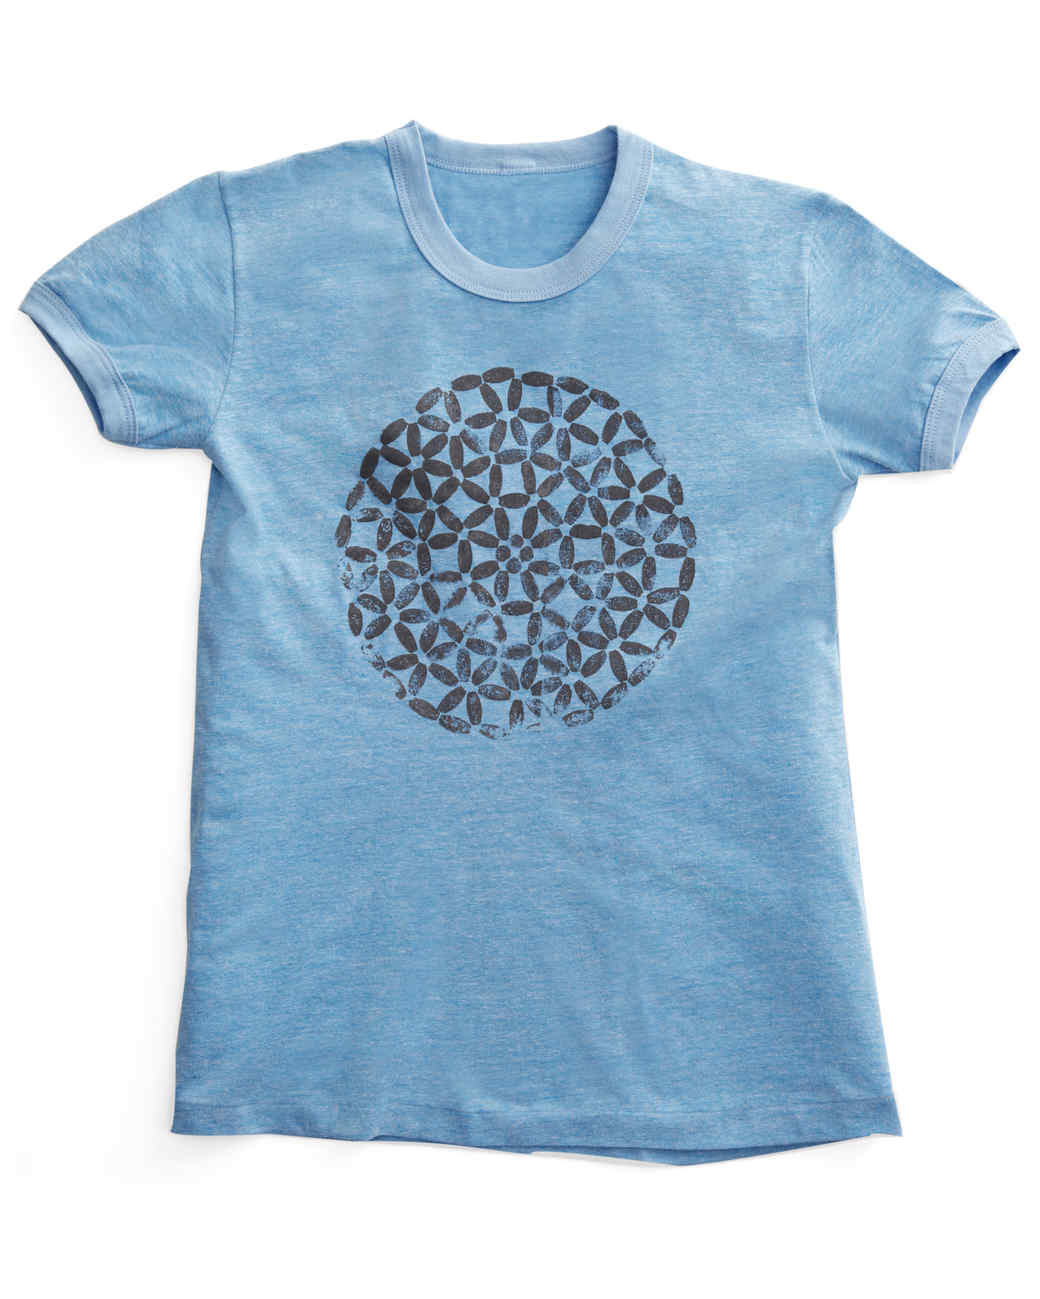 t-shirt-mld108774.jpg